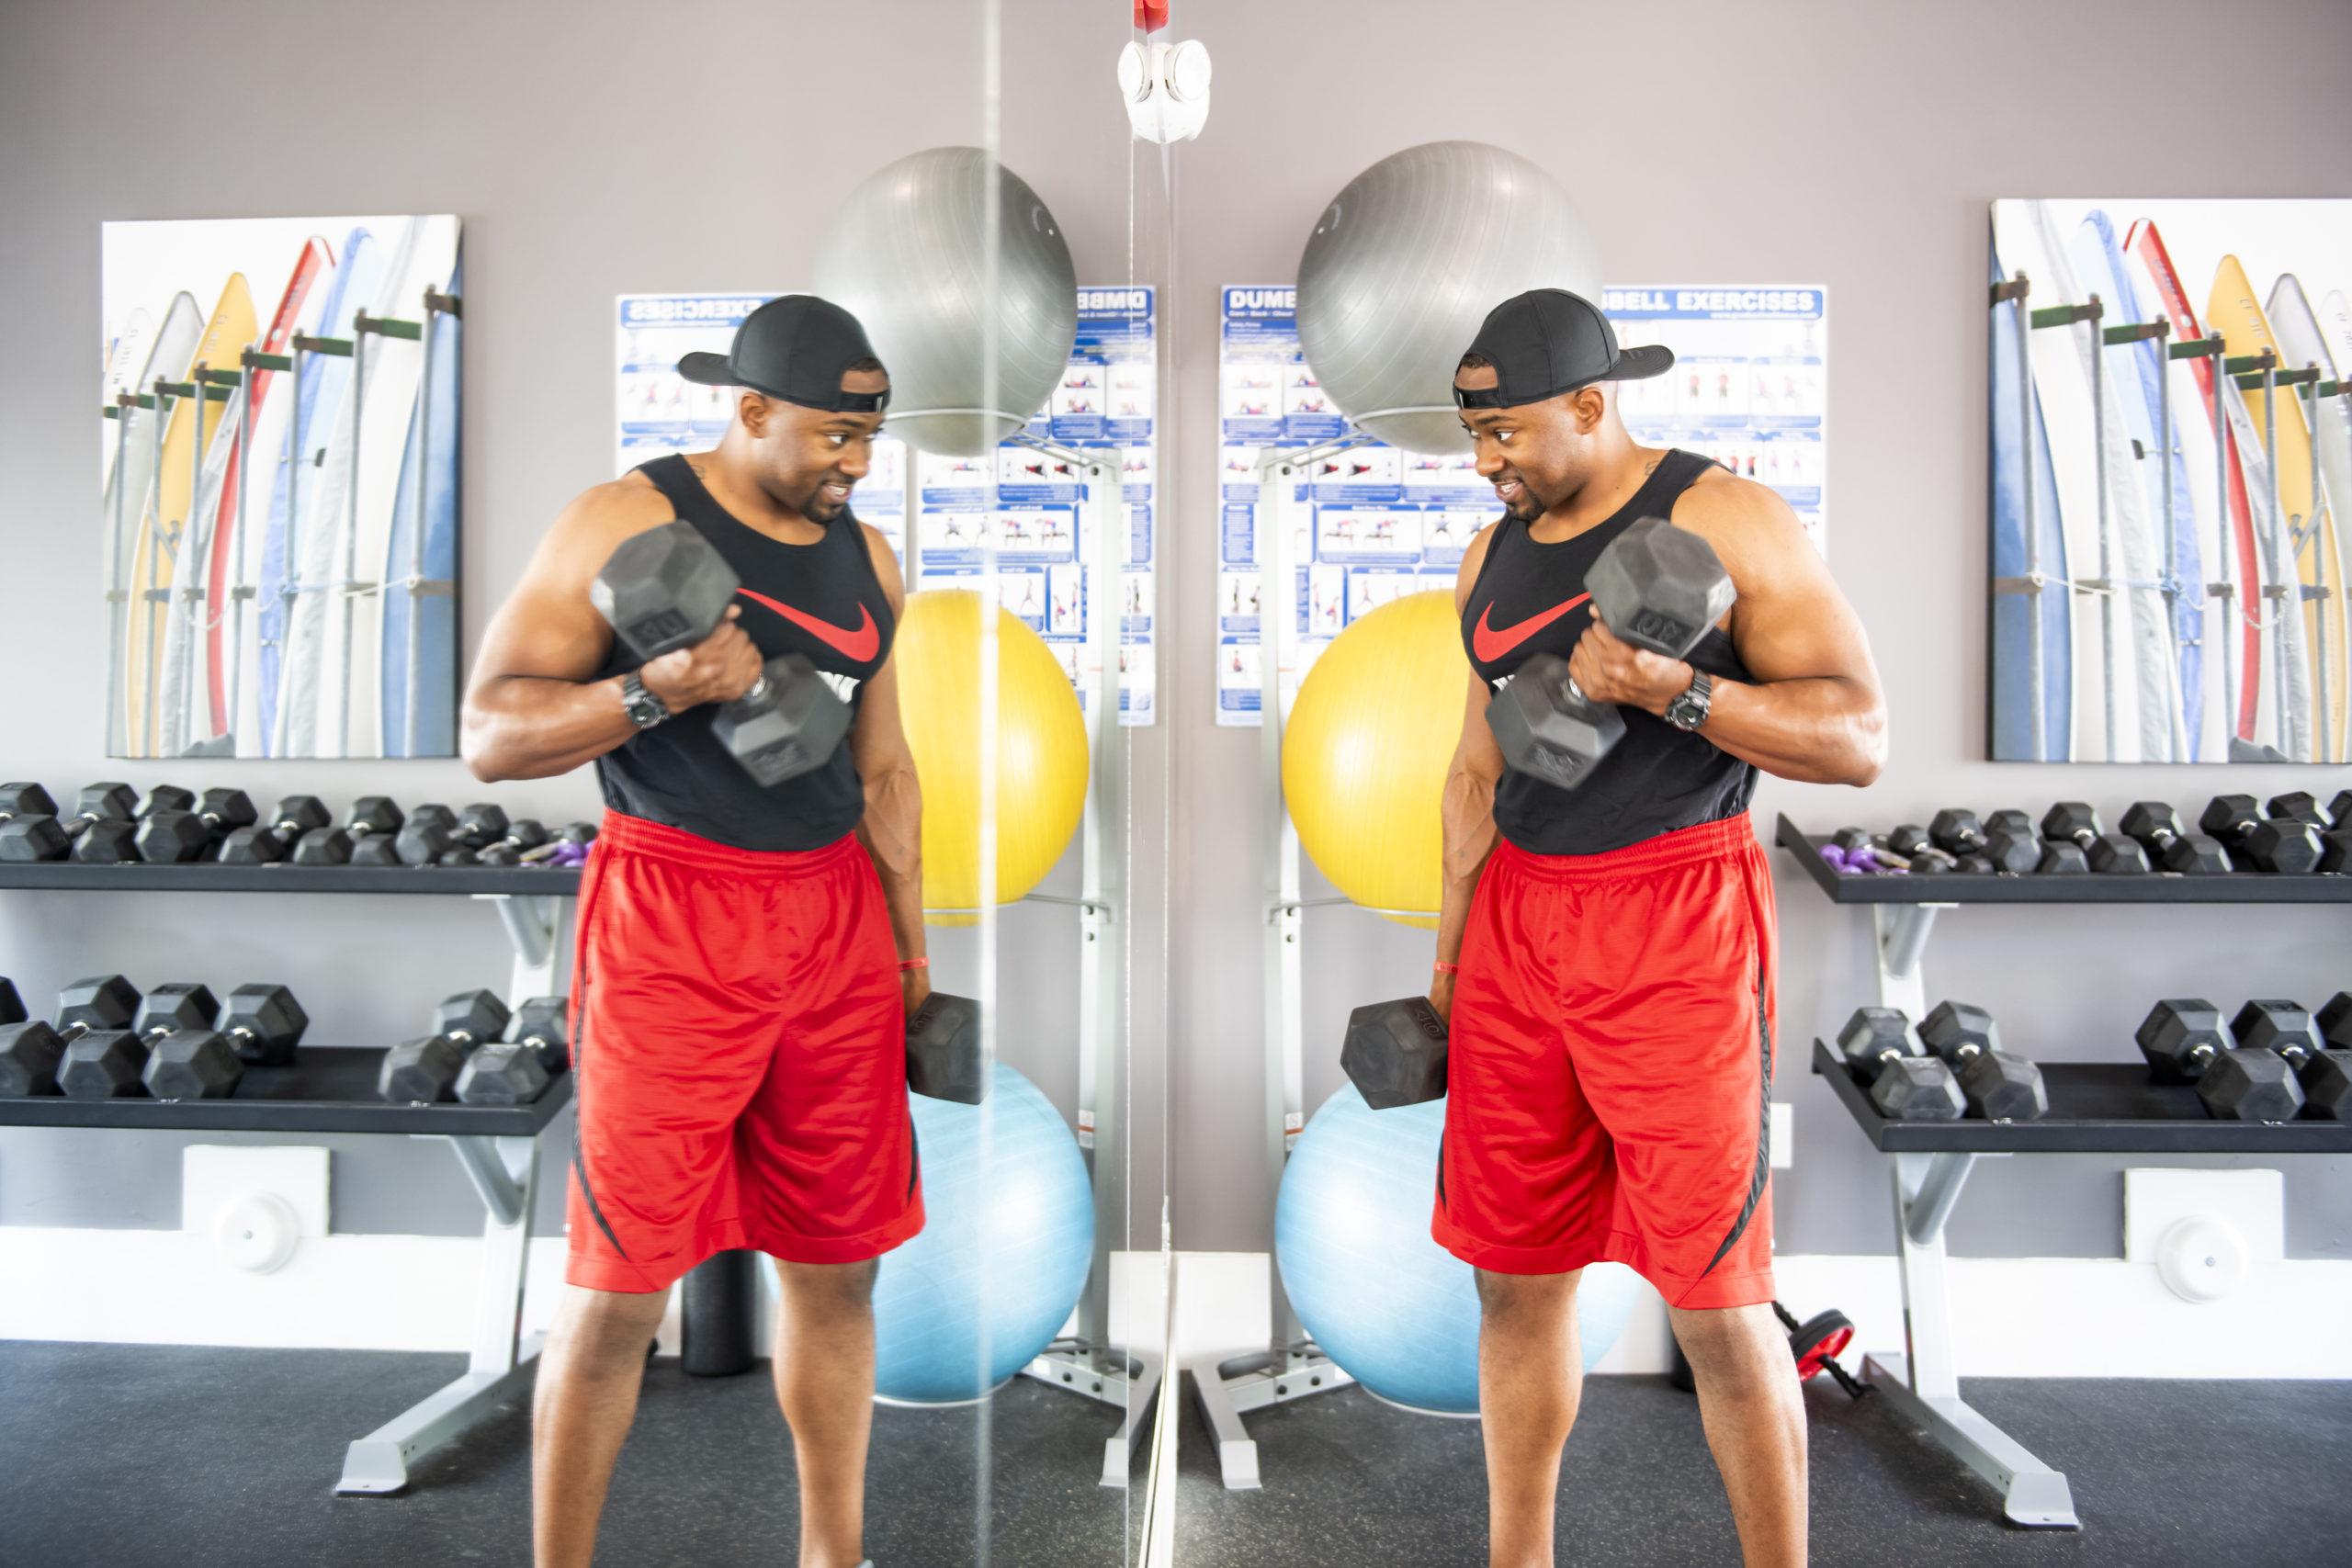 guy using dumbbells in evolve fitness center new workout